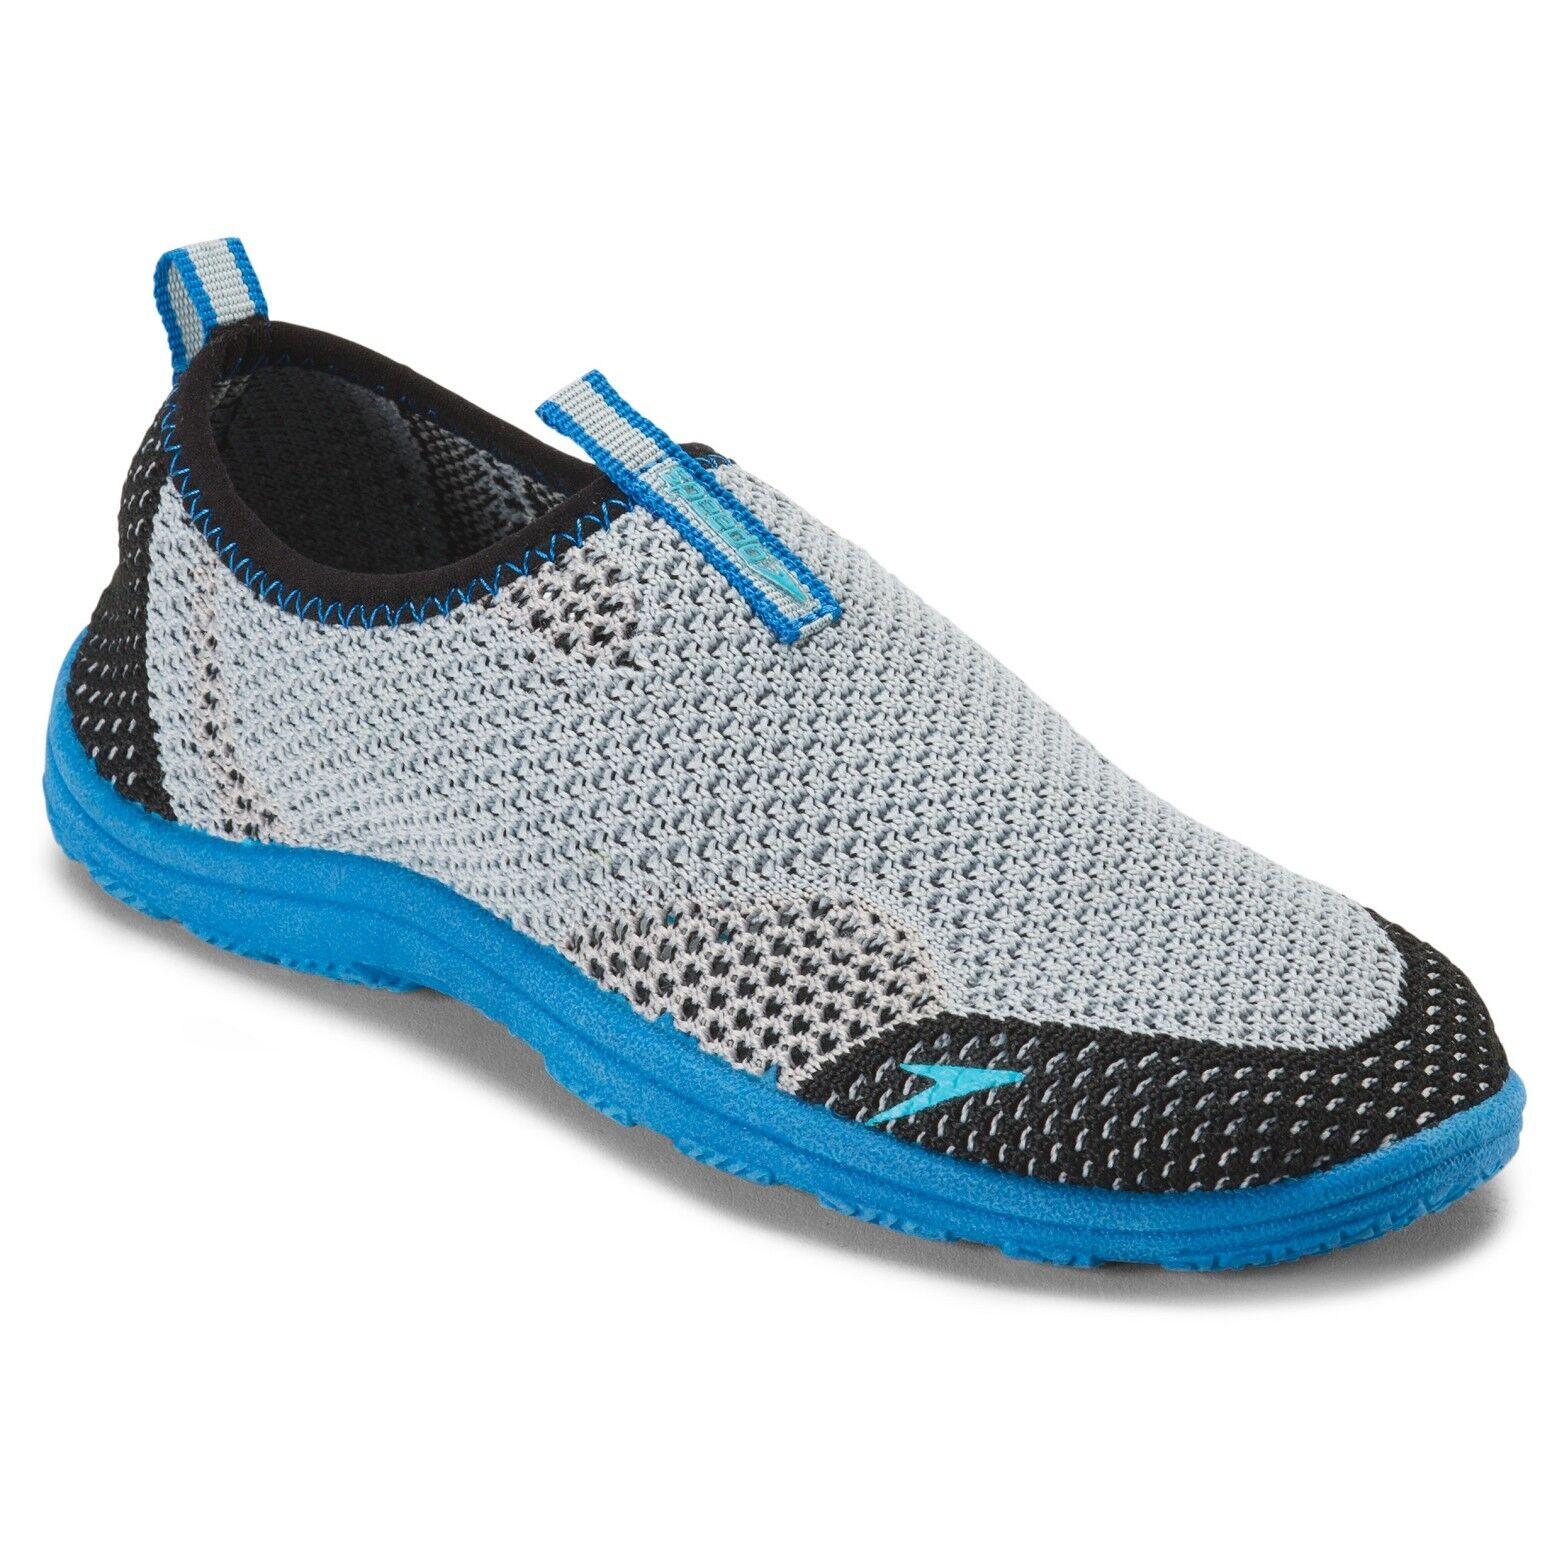 Speedo Jr Boys' Surfwalker Knit Water Shoes CHECK FOR COLOR